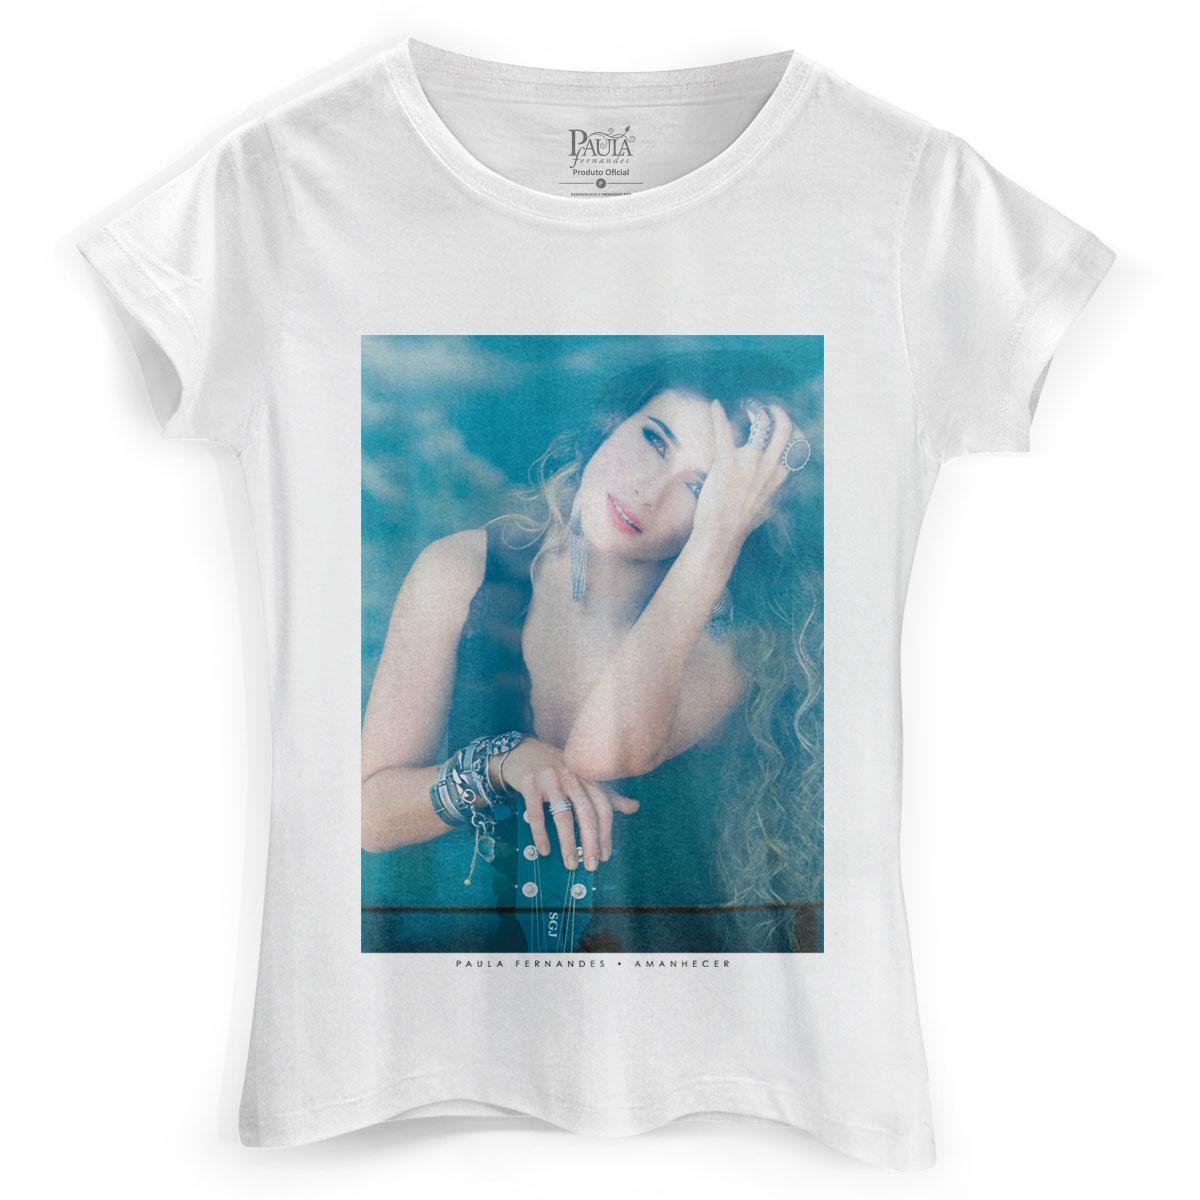 Camiseta Feminina Paula Fernandes Amanhecer Capa